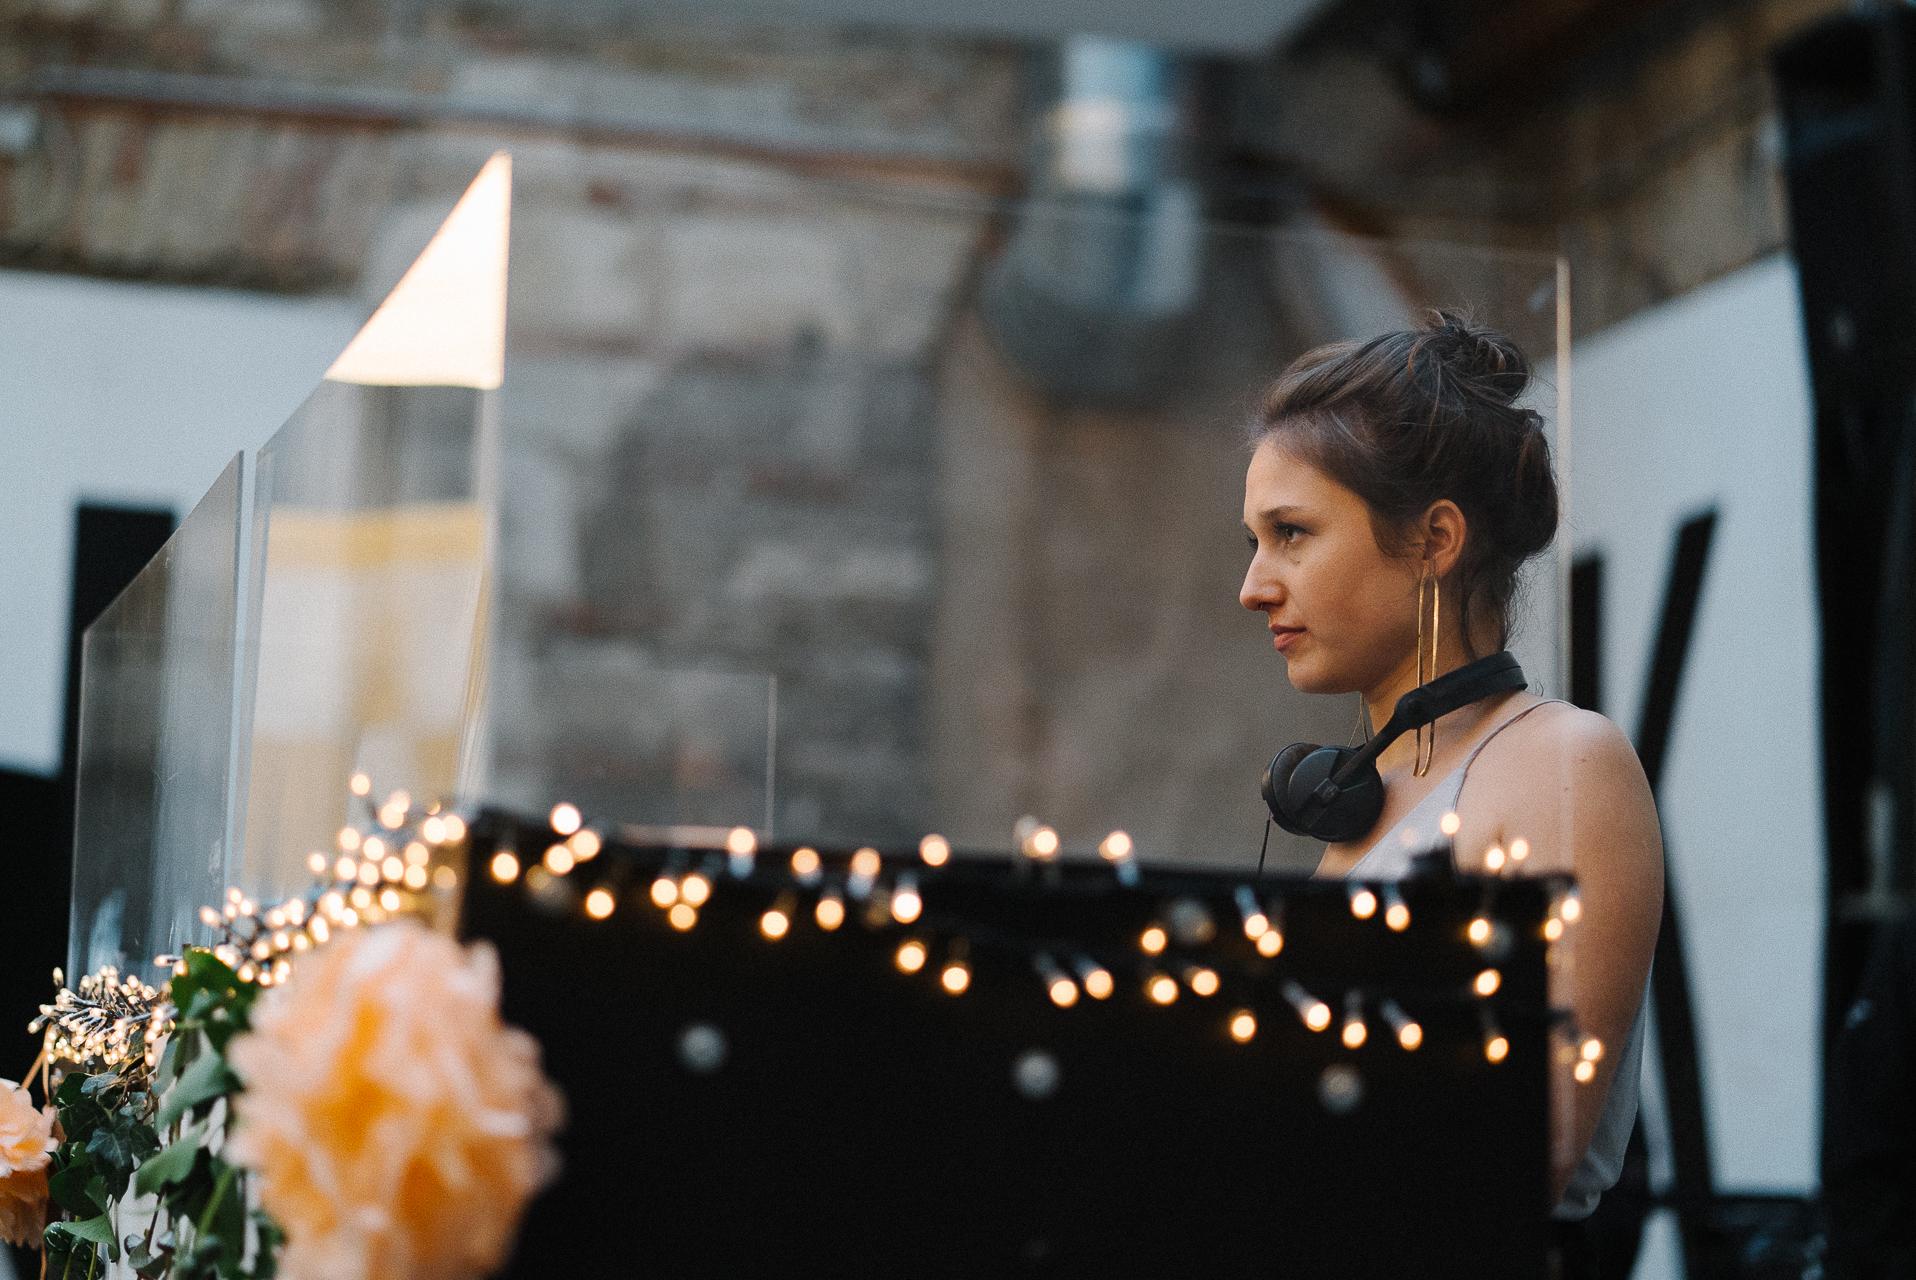 Andrea Waskovics in Balansz (2019)